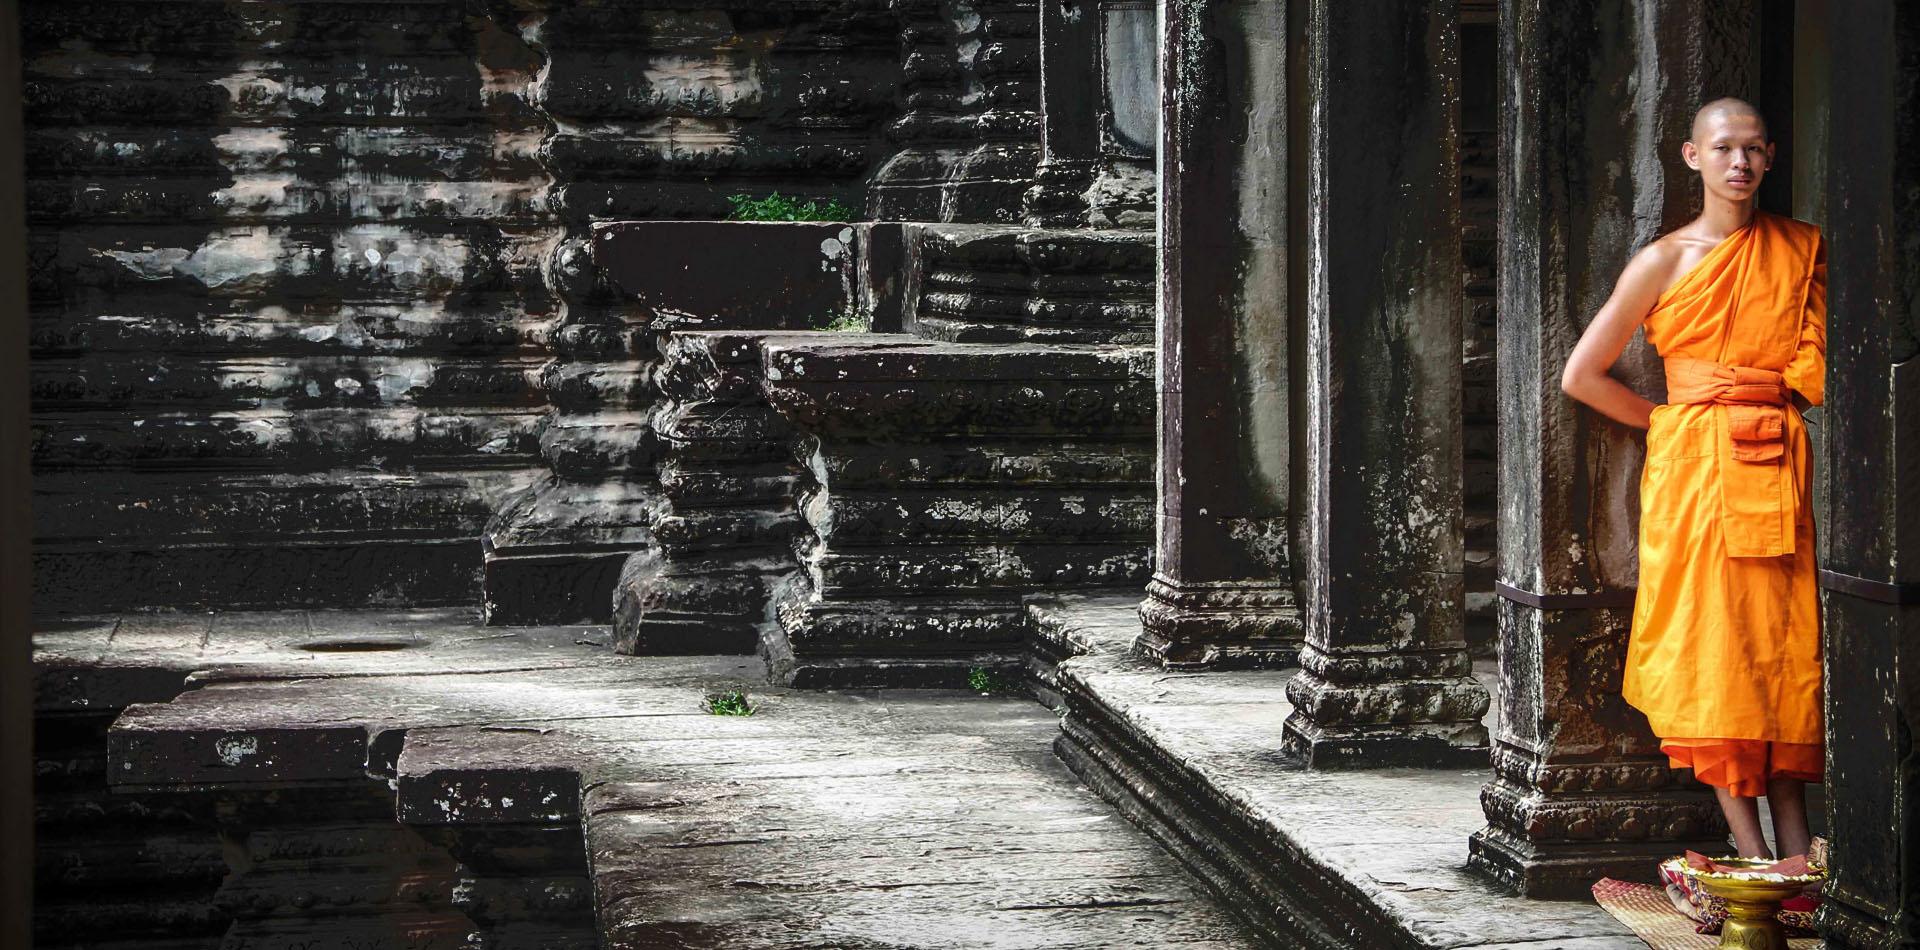 Erlebnisreise Kambodscha, Luxushotel Kambodscha